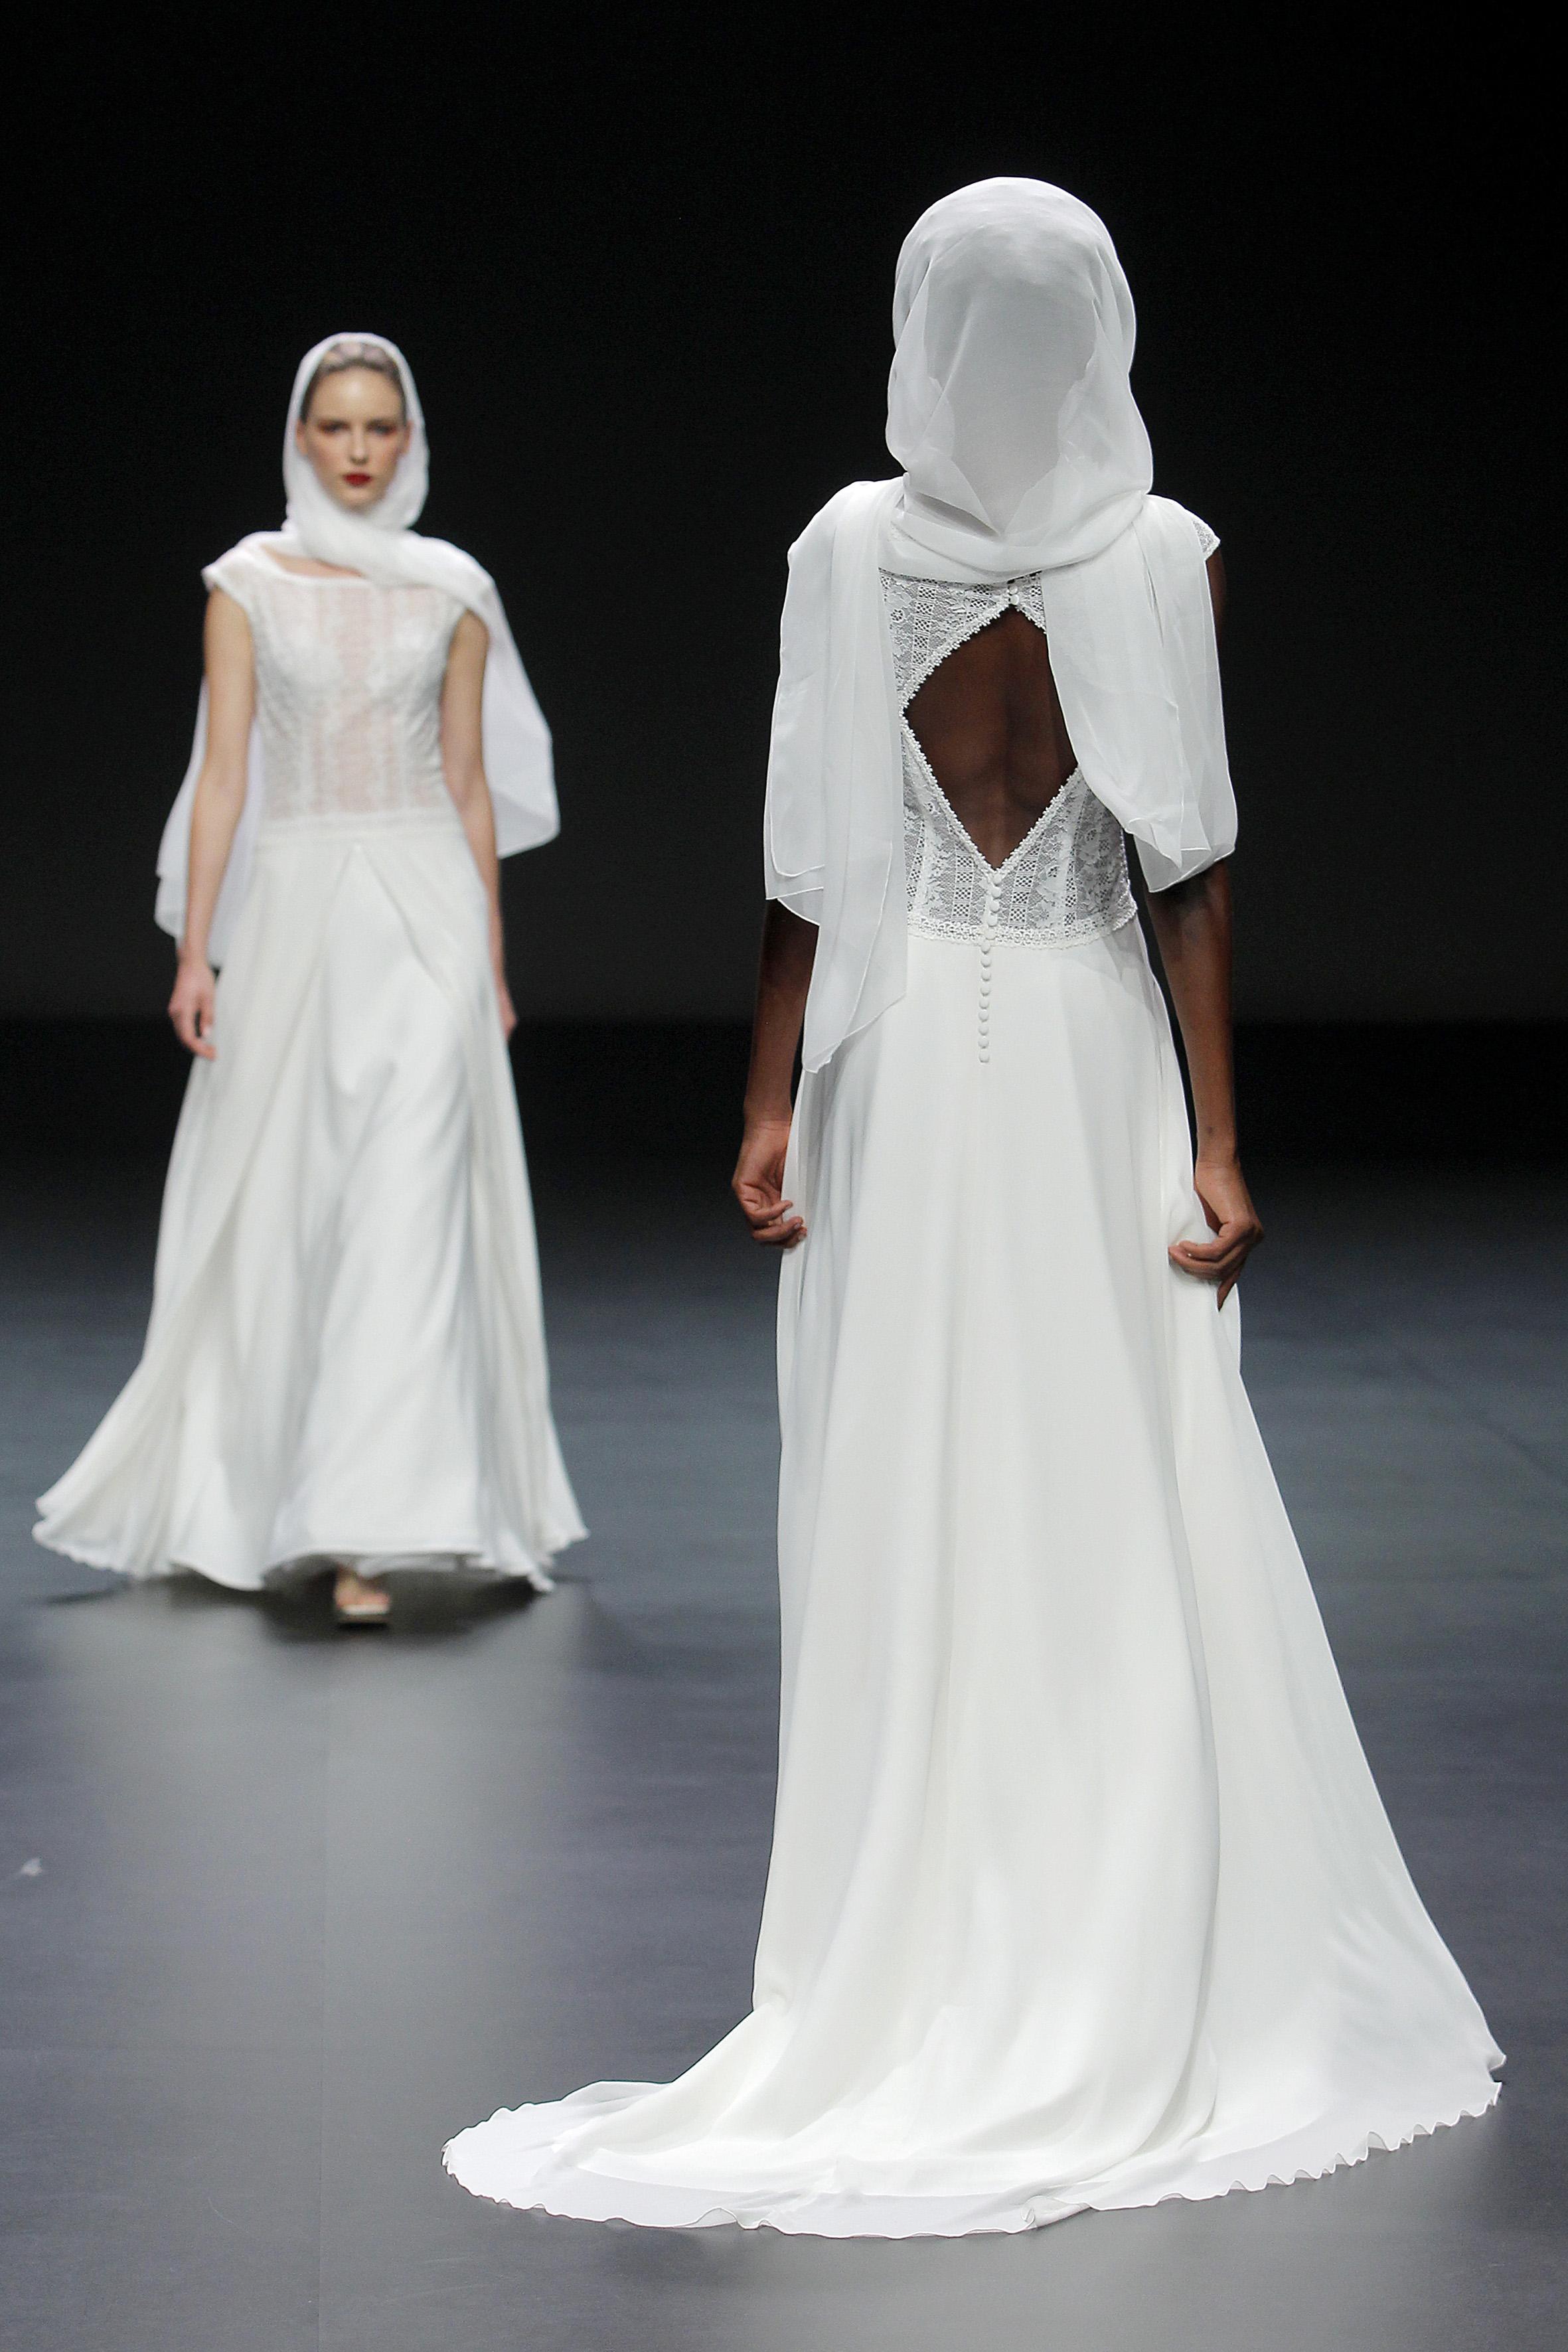 Desfile de Cymbeline Paris Couture en VBBFW20 experience Primavera Veranoe_026.jpg